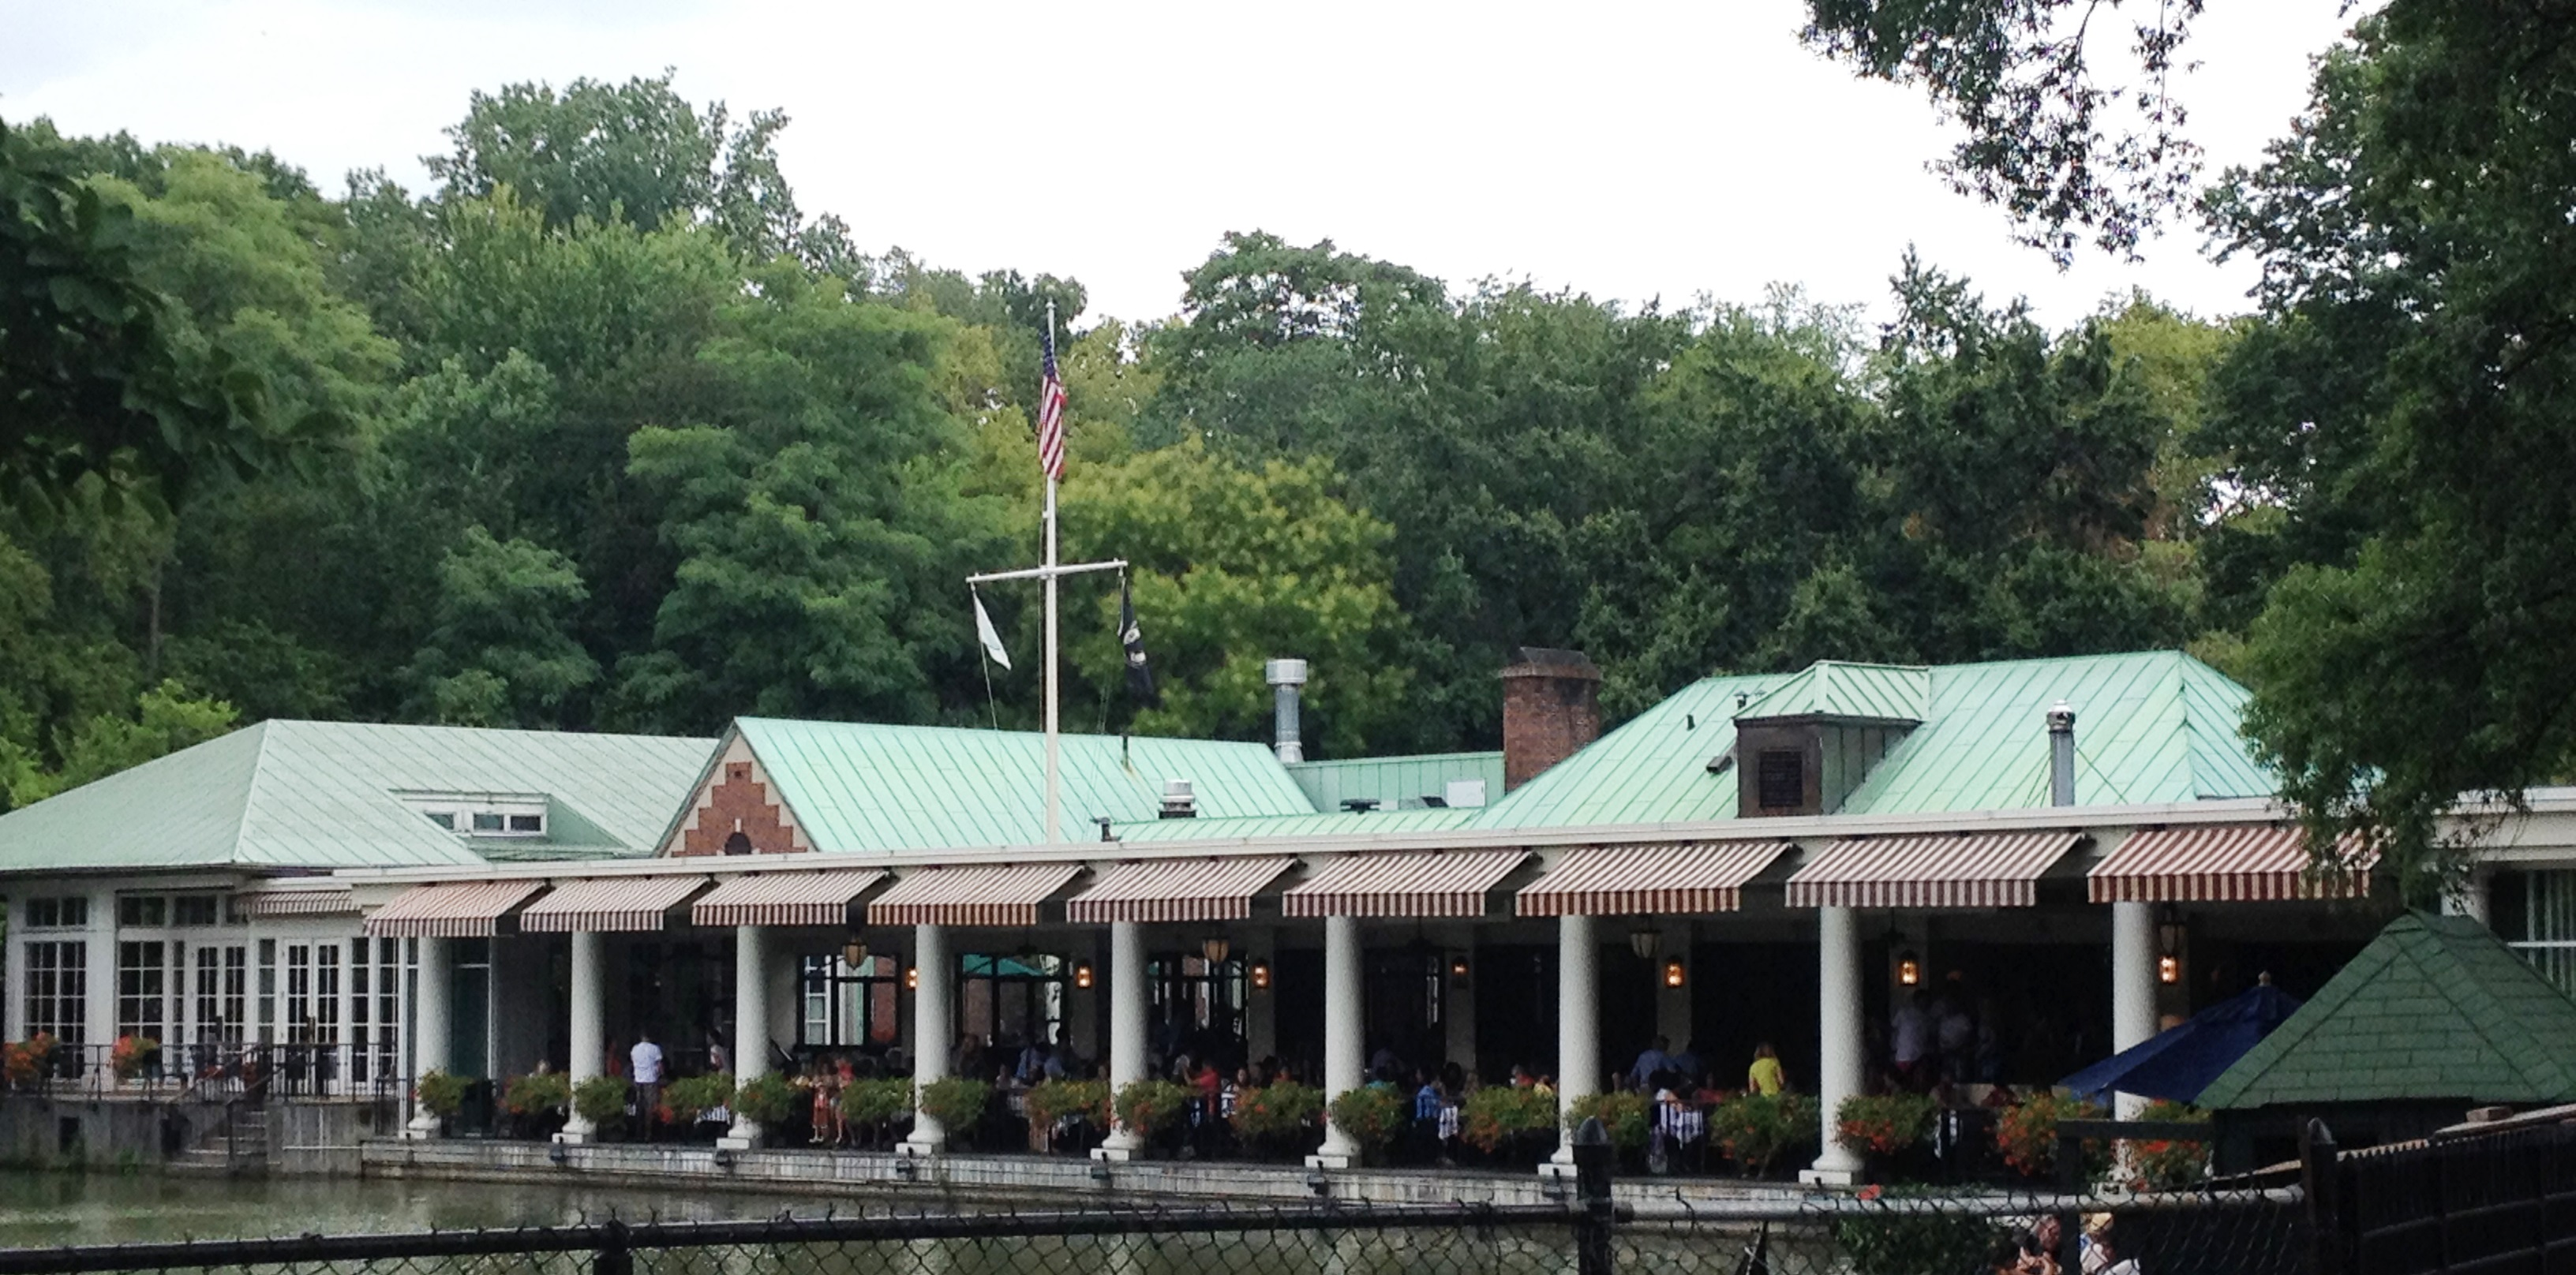 loeb-boathouse-central-park-new-york-travelgrip- (1)